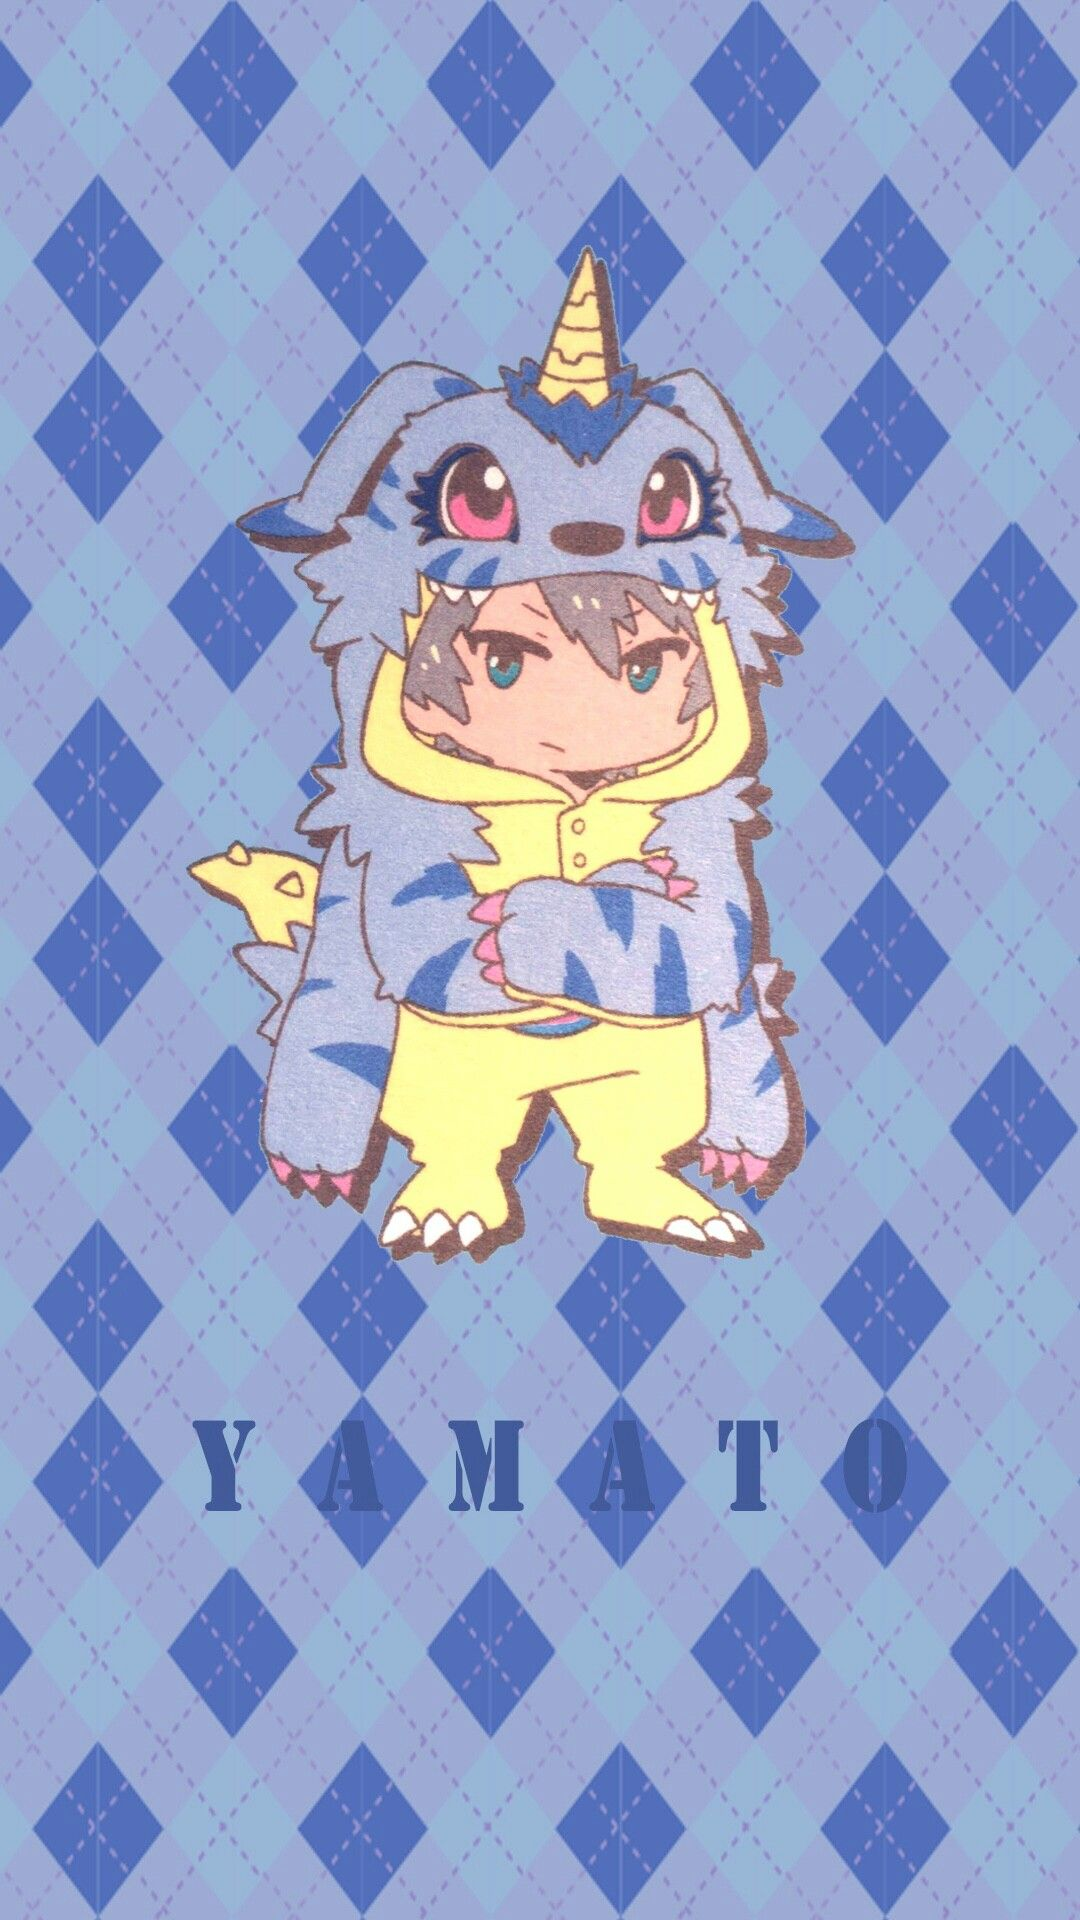 Pin de Moises David Orozco Rivera en Digimon | Pinterest | Digimon ...